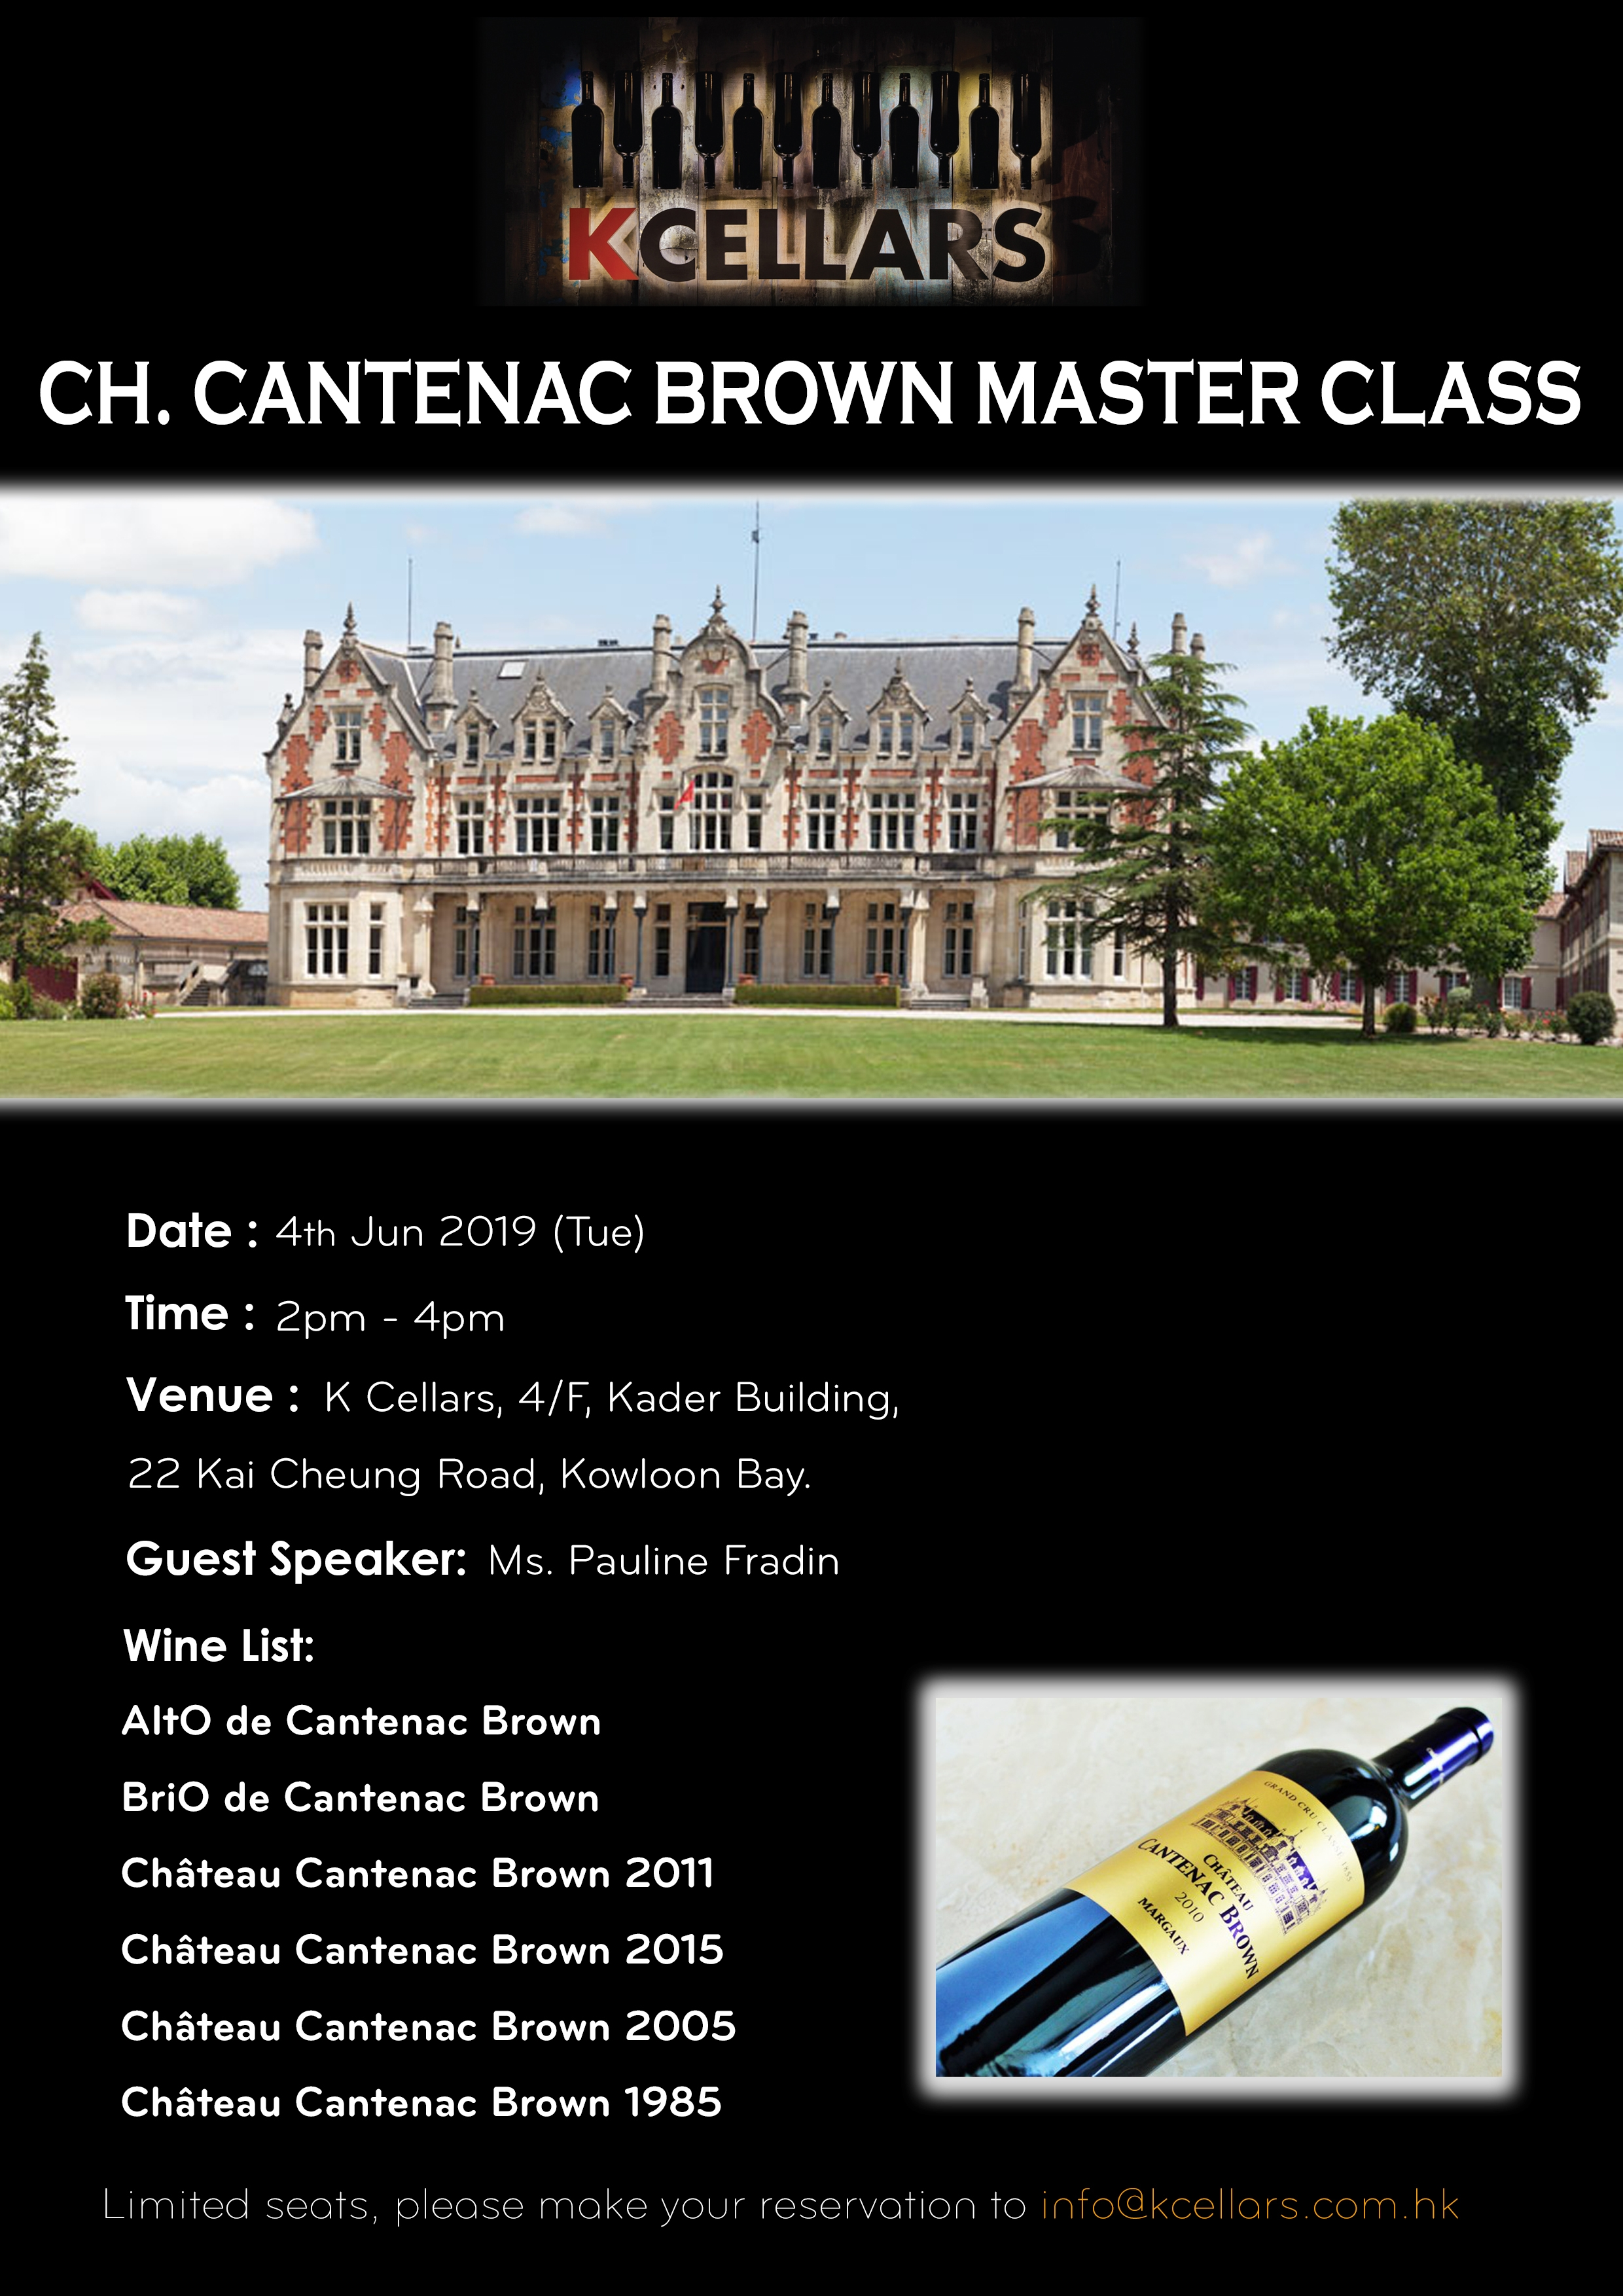 Ch. Cantenac Brown Master Class